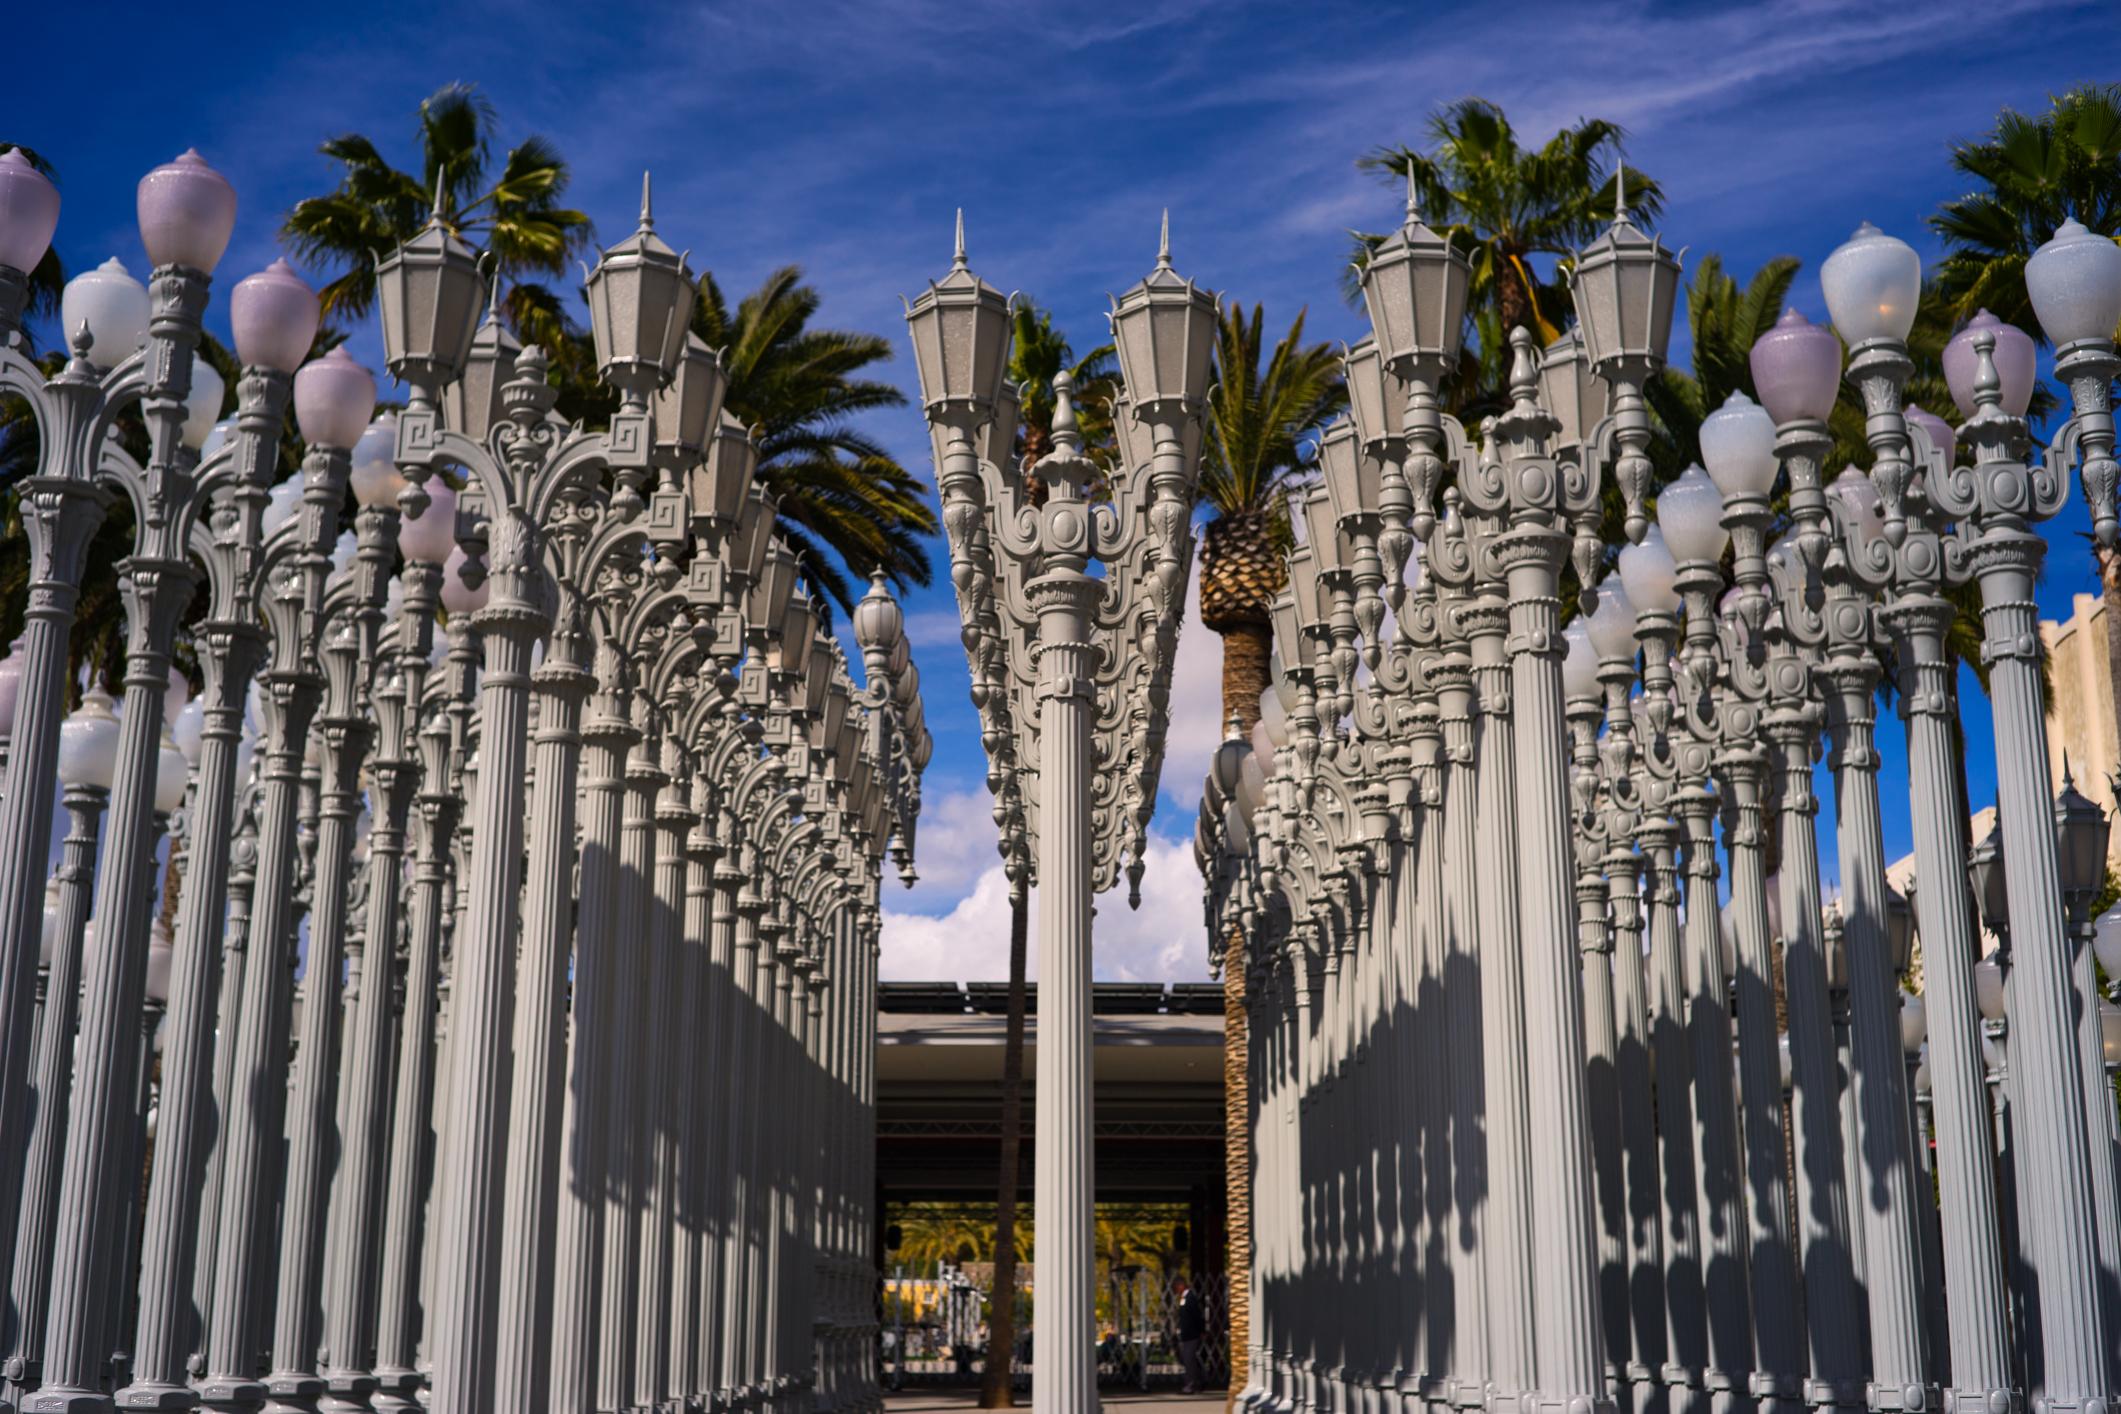 Los-Angeles-LACMA-lamp-posts.jpg